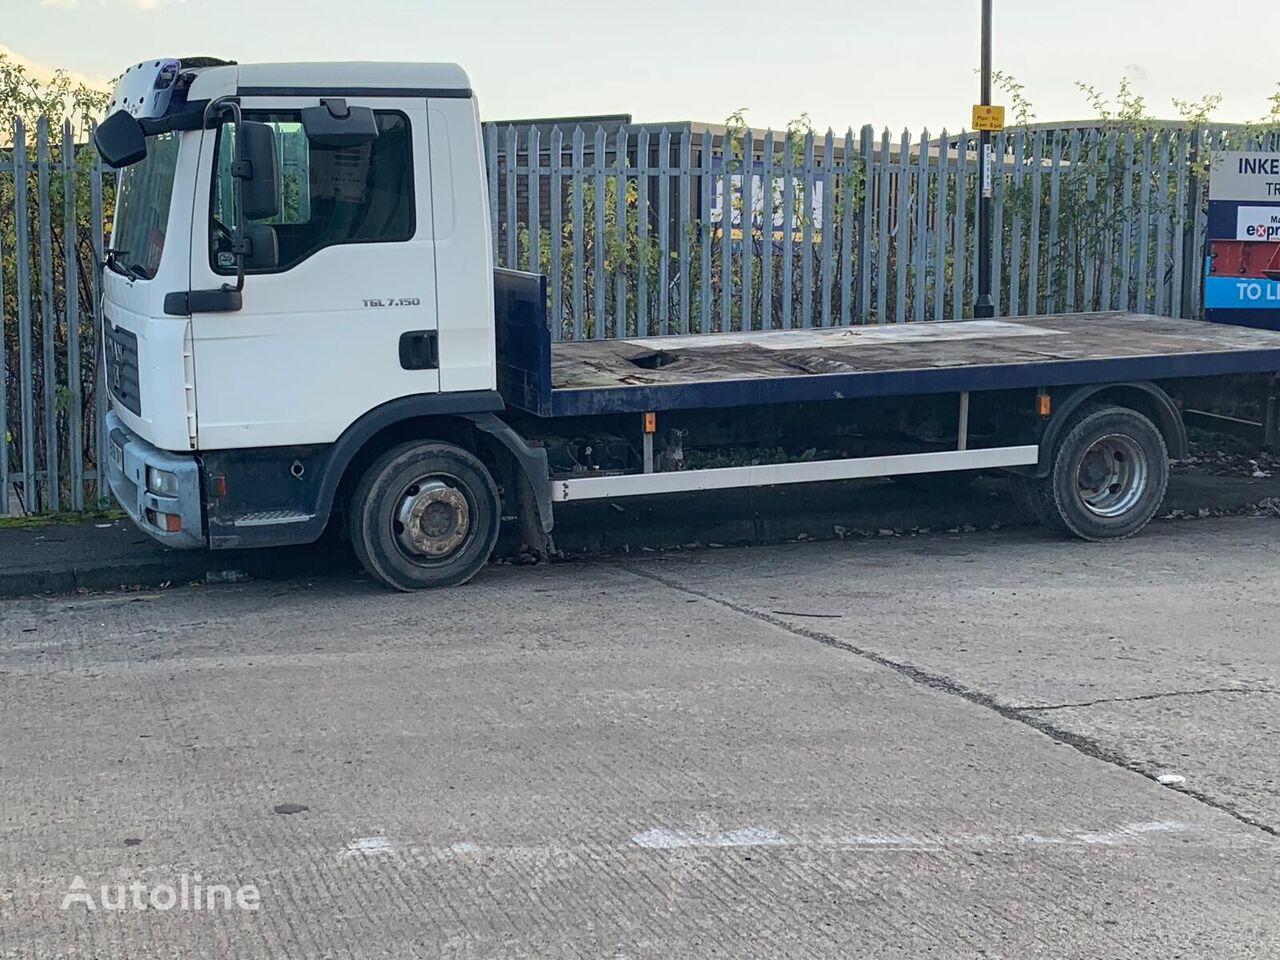 MAN TGL / TGM 2006 – 2012 BREAKING platform truck for parts